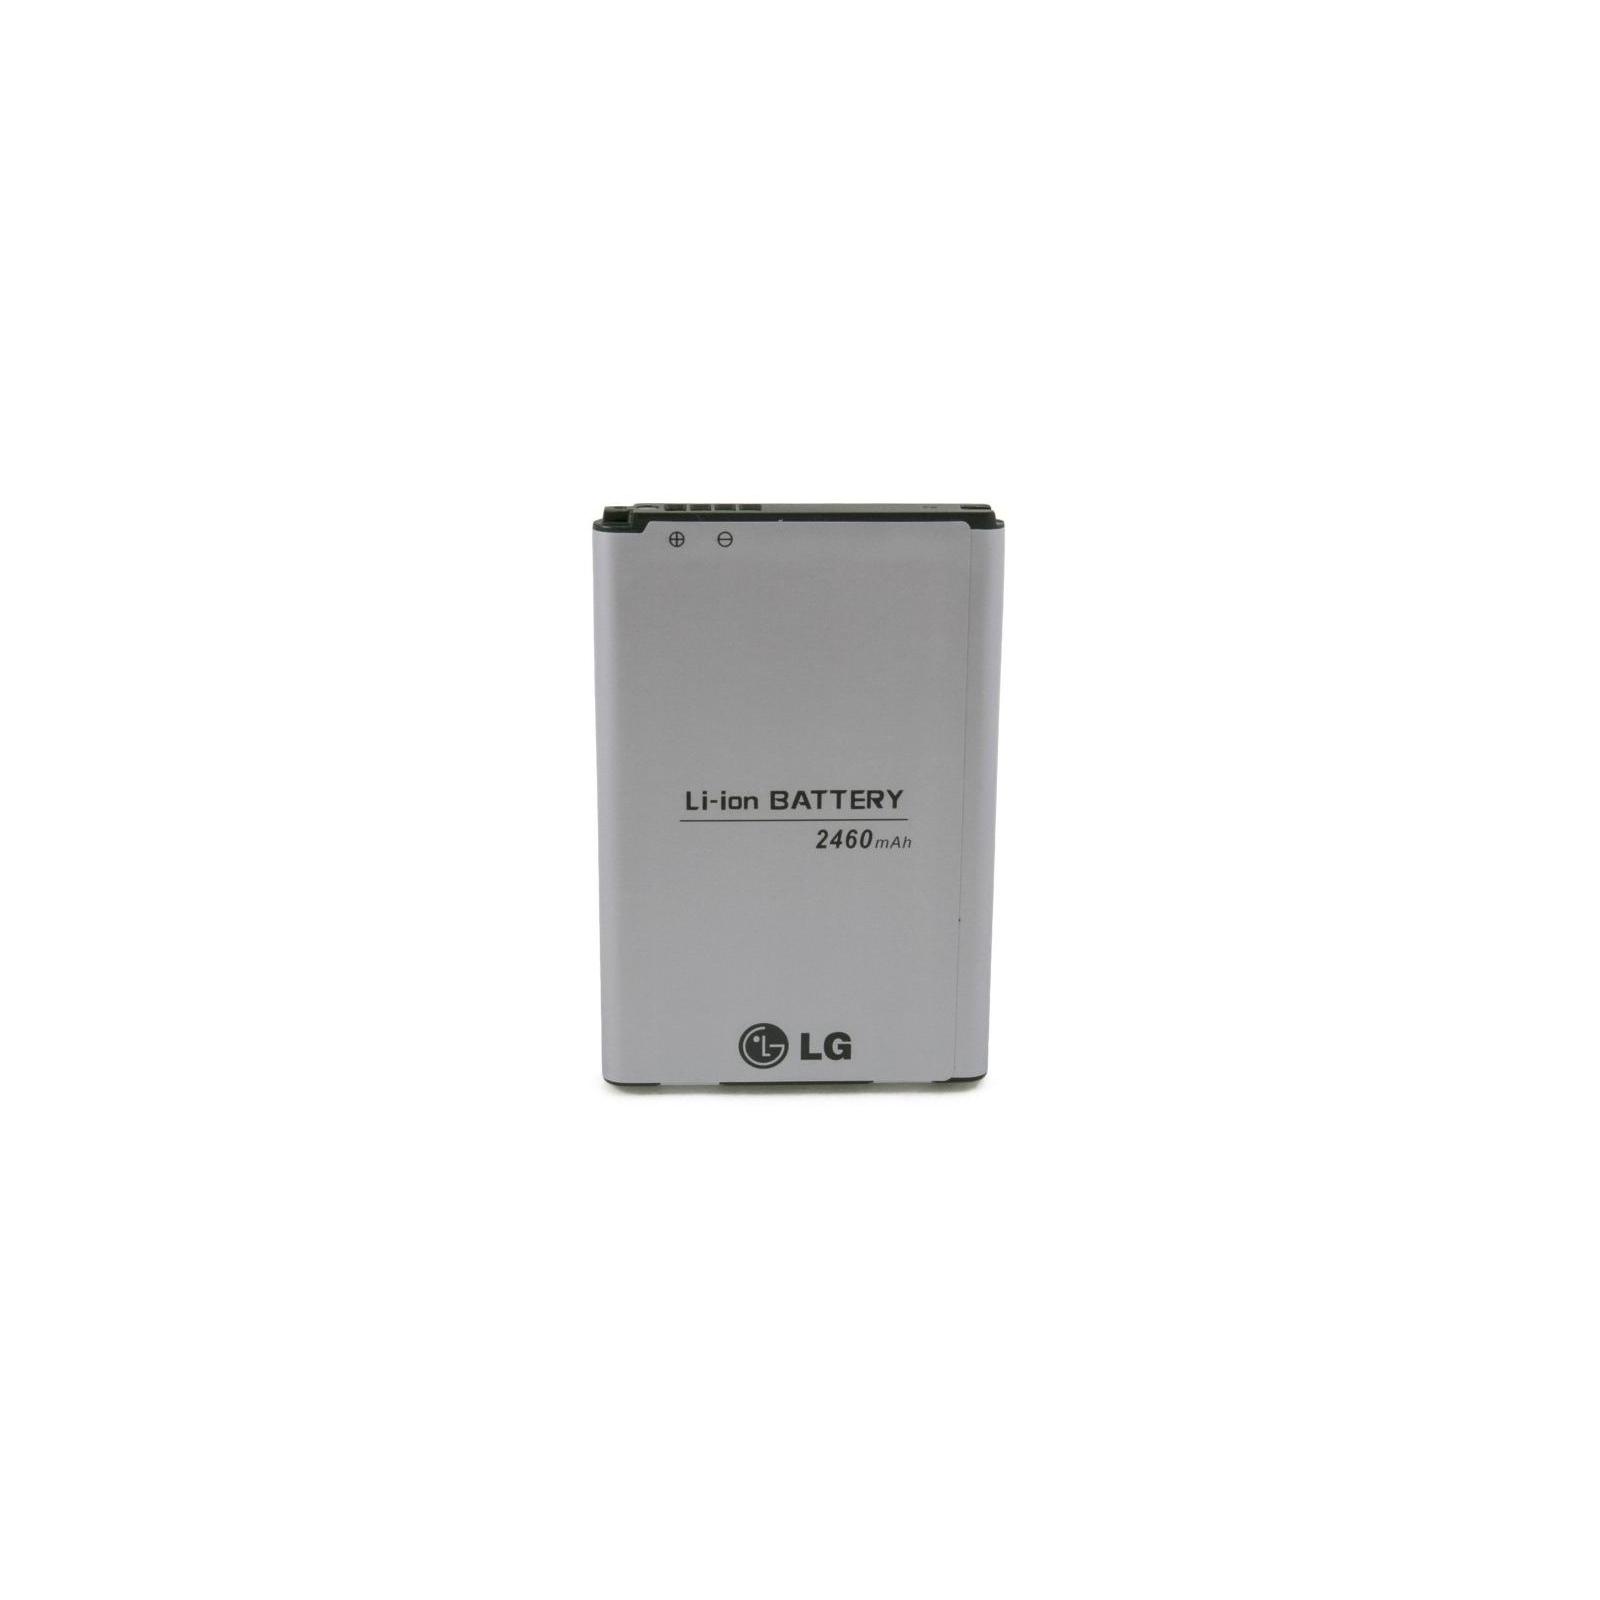 Аккумуляторная батарея EXTRADIGITAL LG Optimus L7 II Dual P715 (2460 mAh) (BML6383) изображение 2